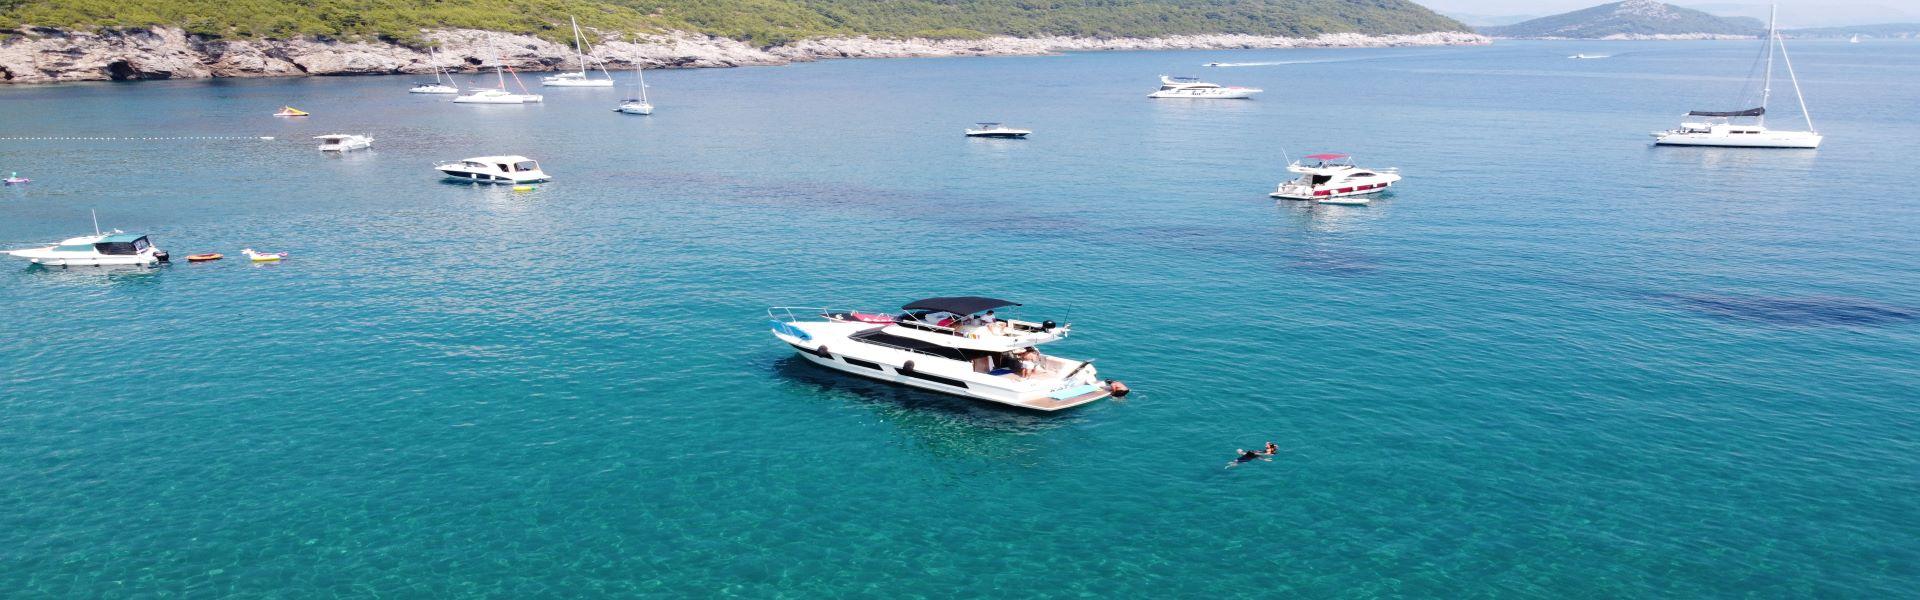 GUIDE TO CROATIA ISLAND HOPPING